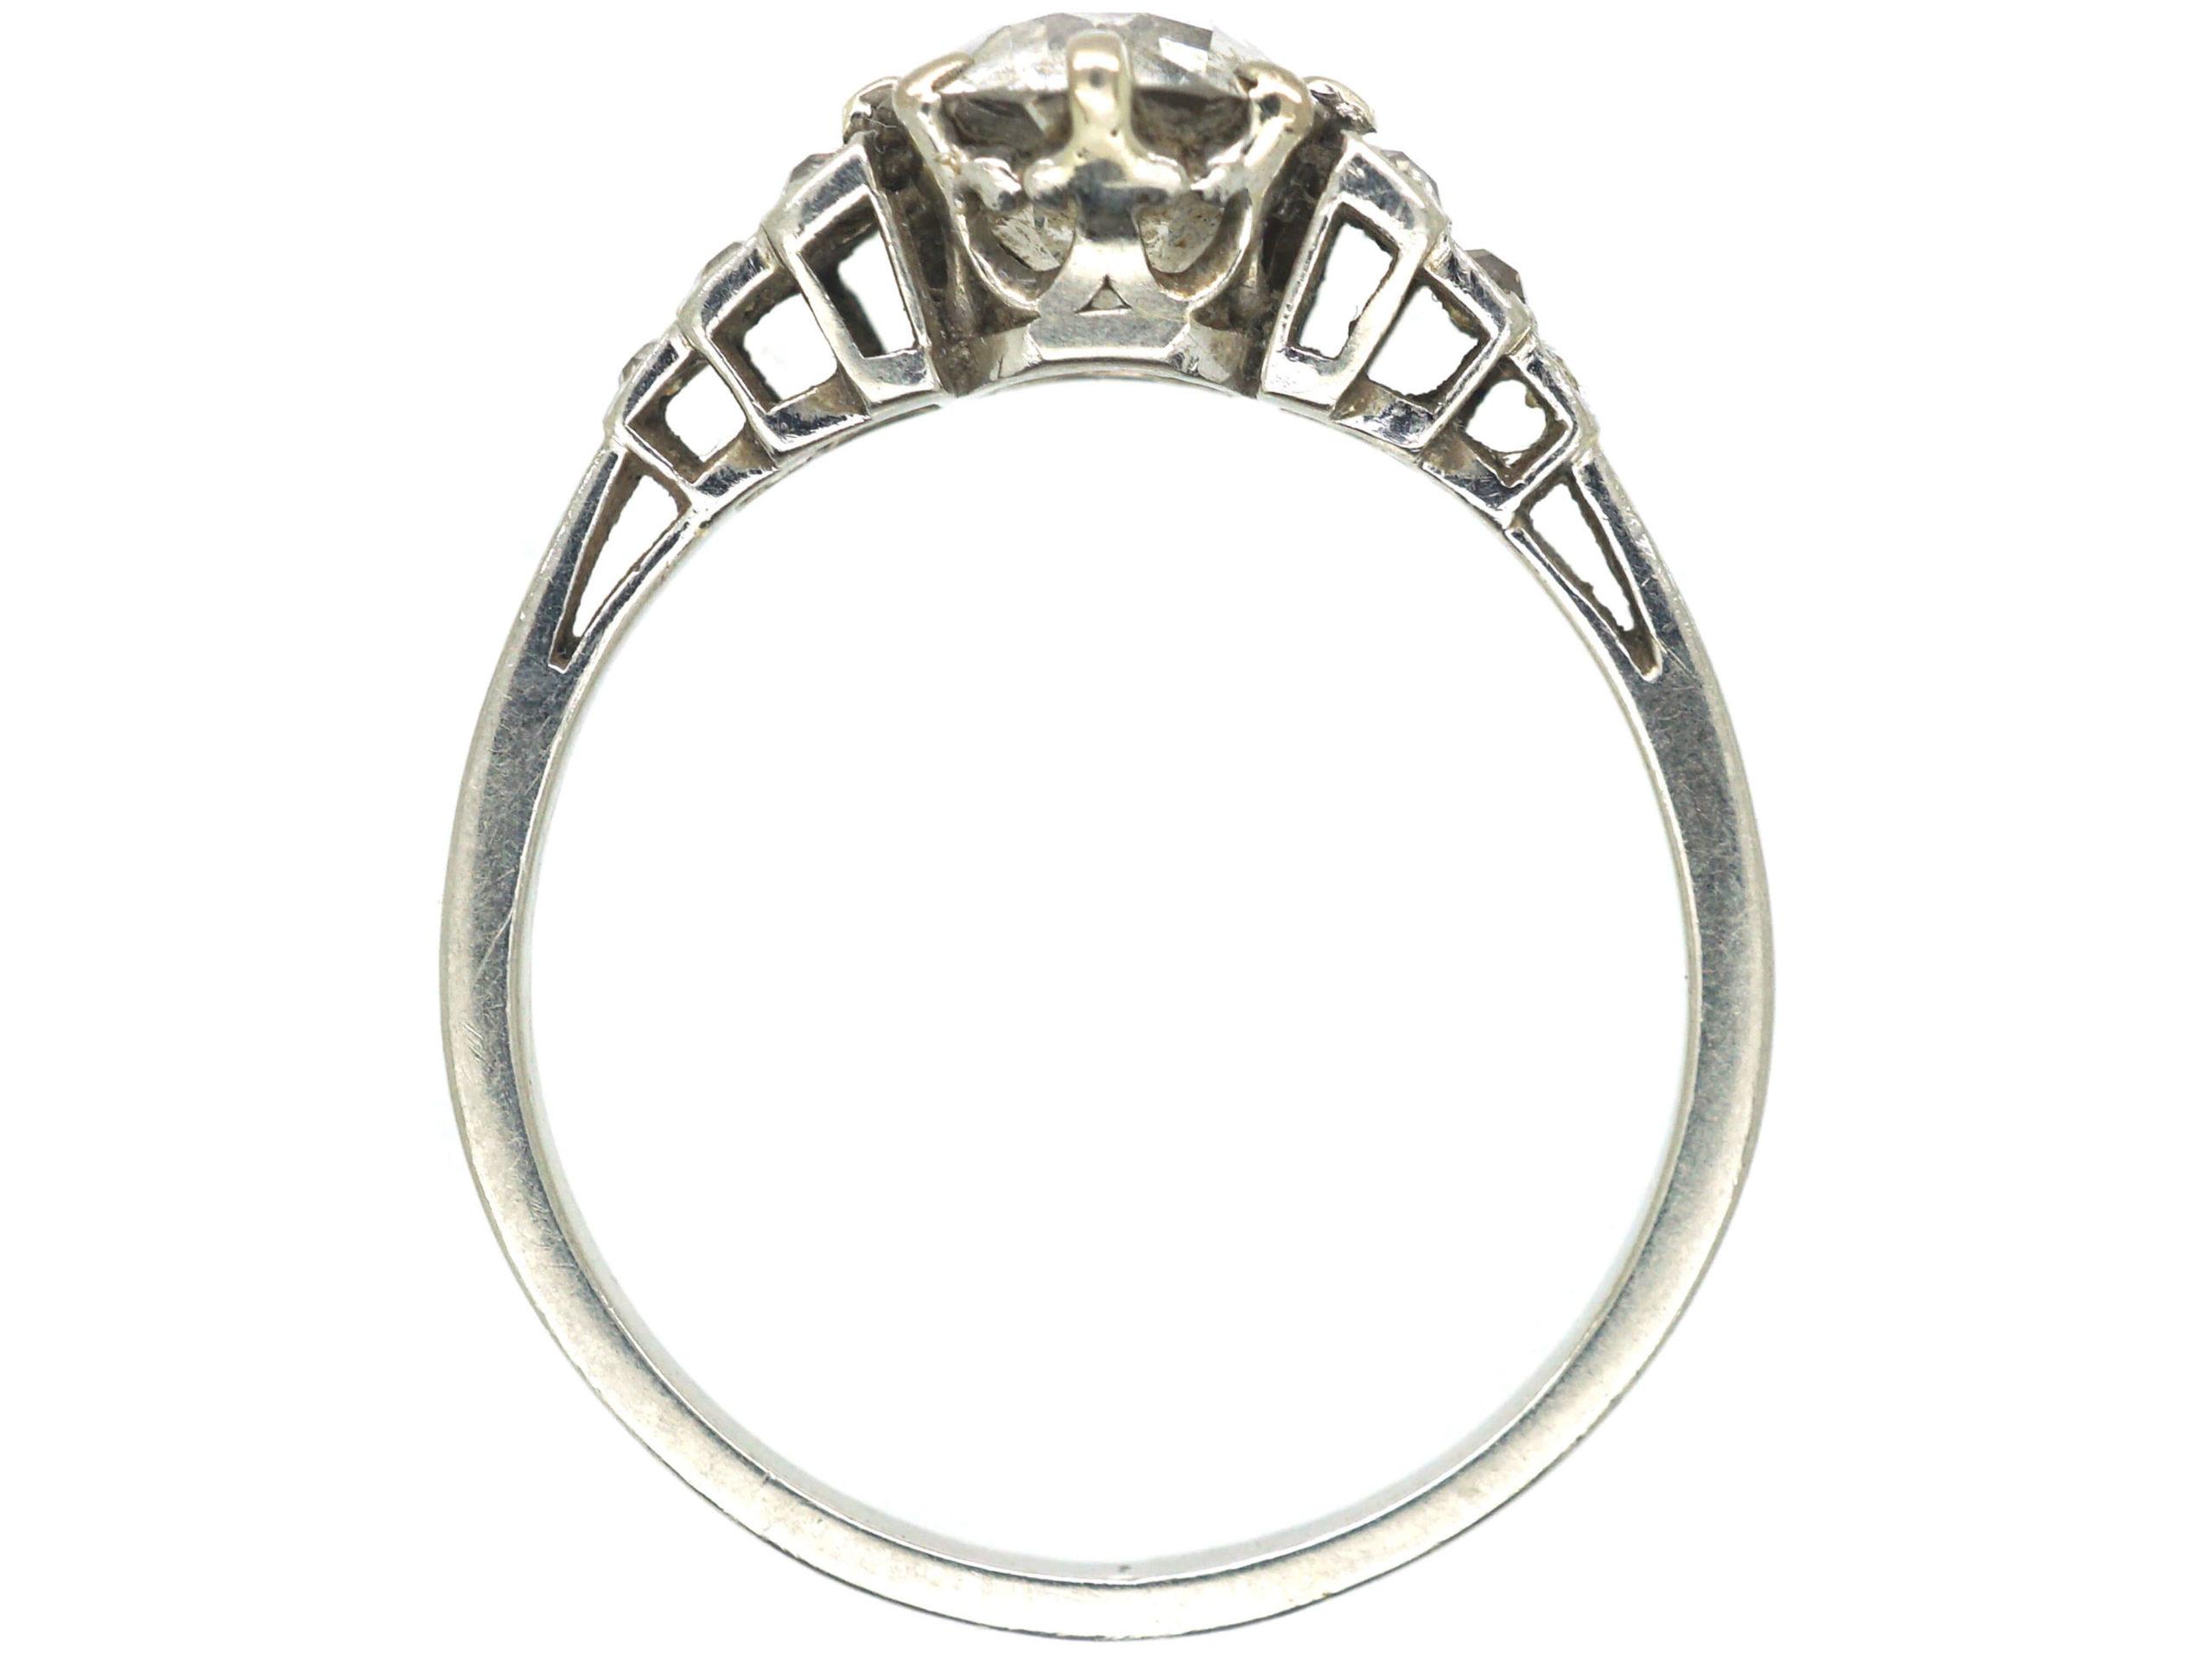 Art Deco Platinum & Diamond Solitaire Ring with Diamond Set Step Shoulders